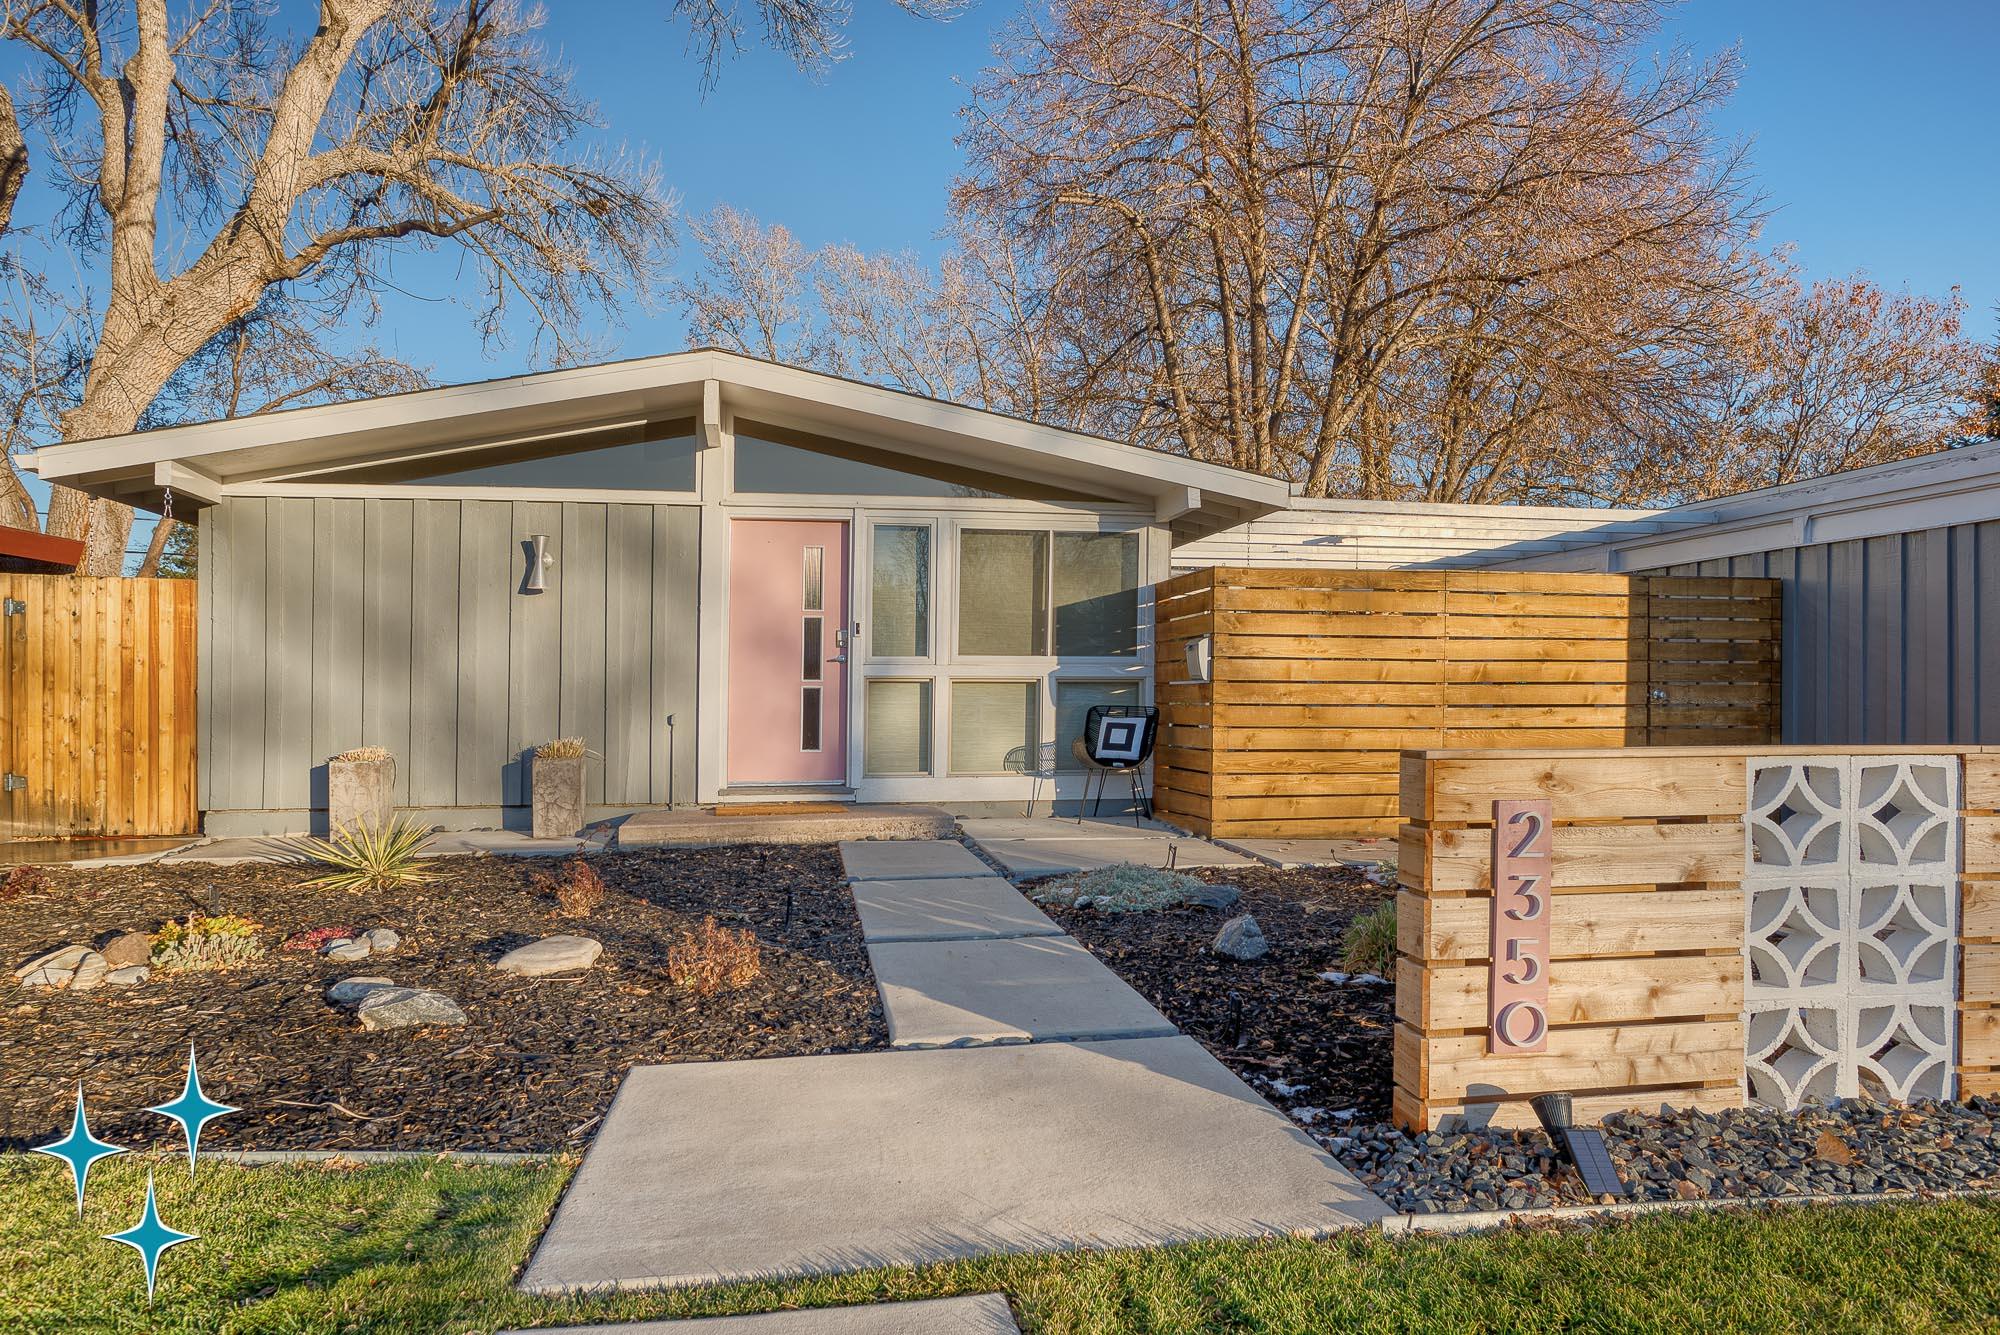 2350 S Osceola Street, a Cliff May Home in Denver's Harvey Park neighborhood. SOLD by Arian Kinney. Photo by Atom Stevens Photography.